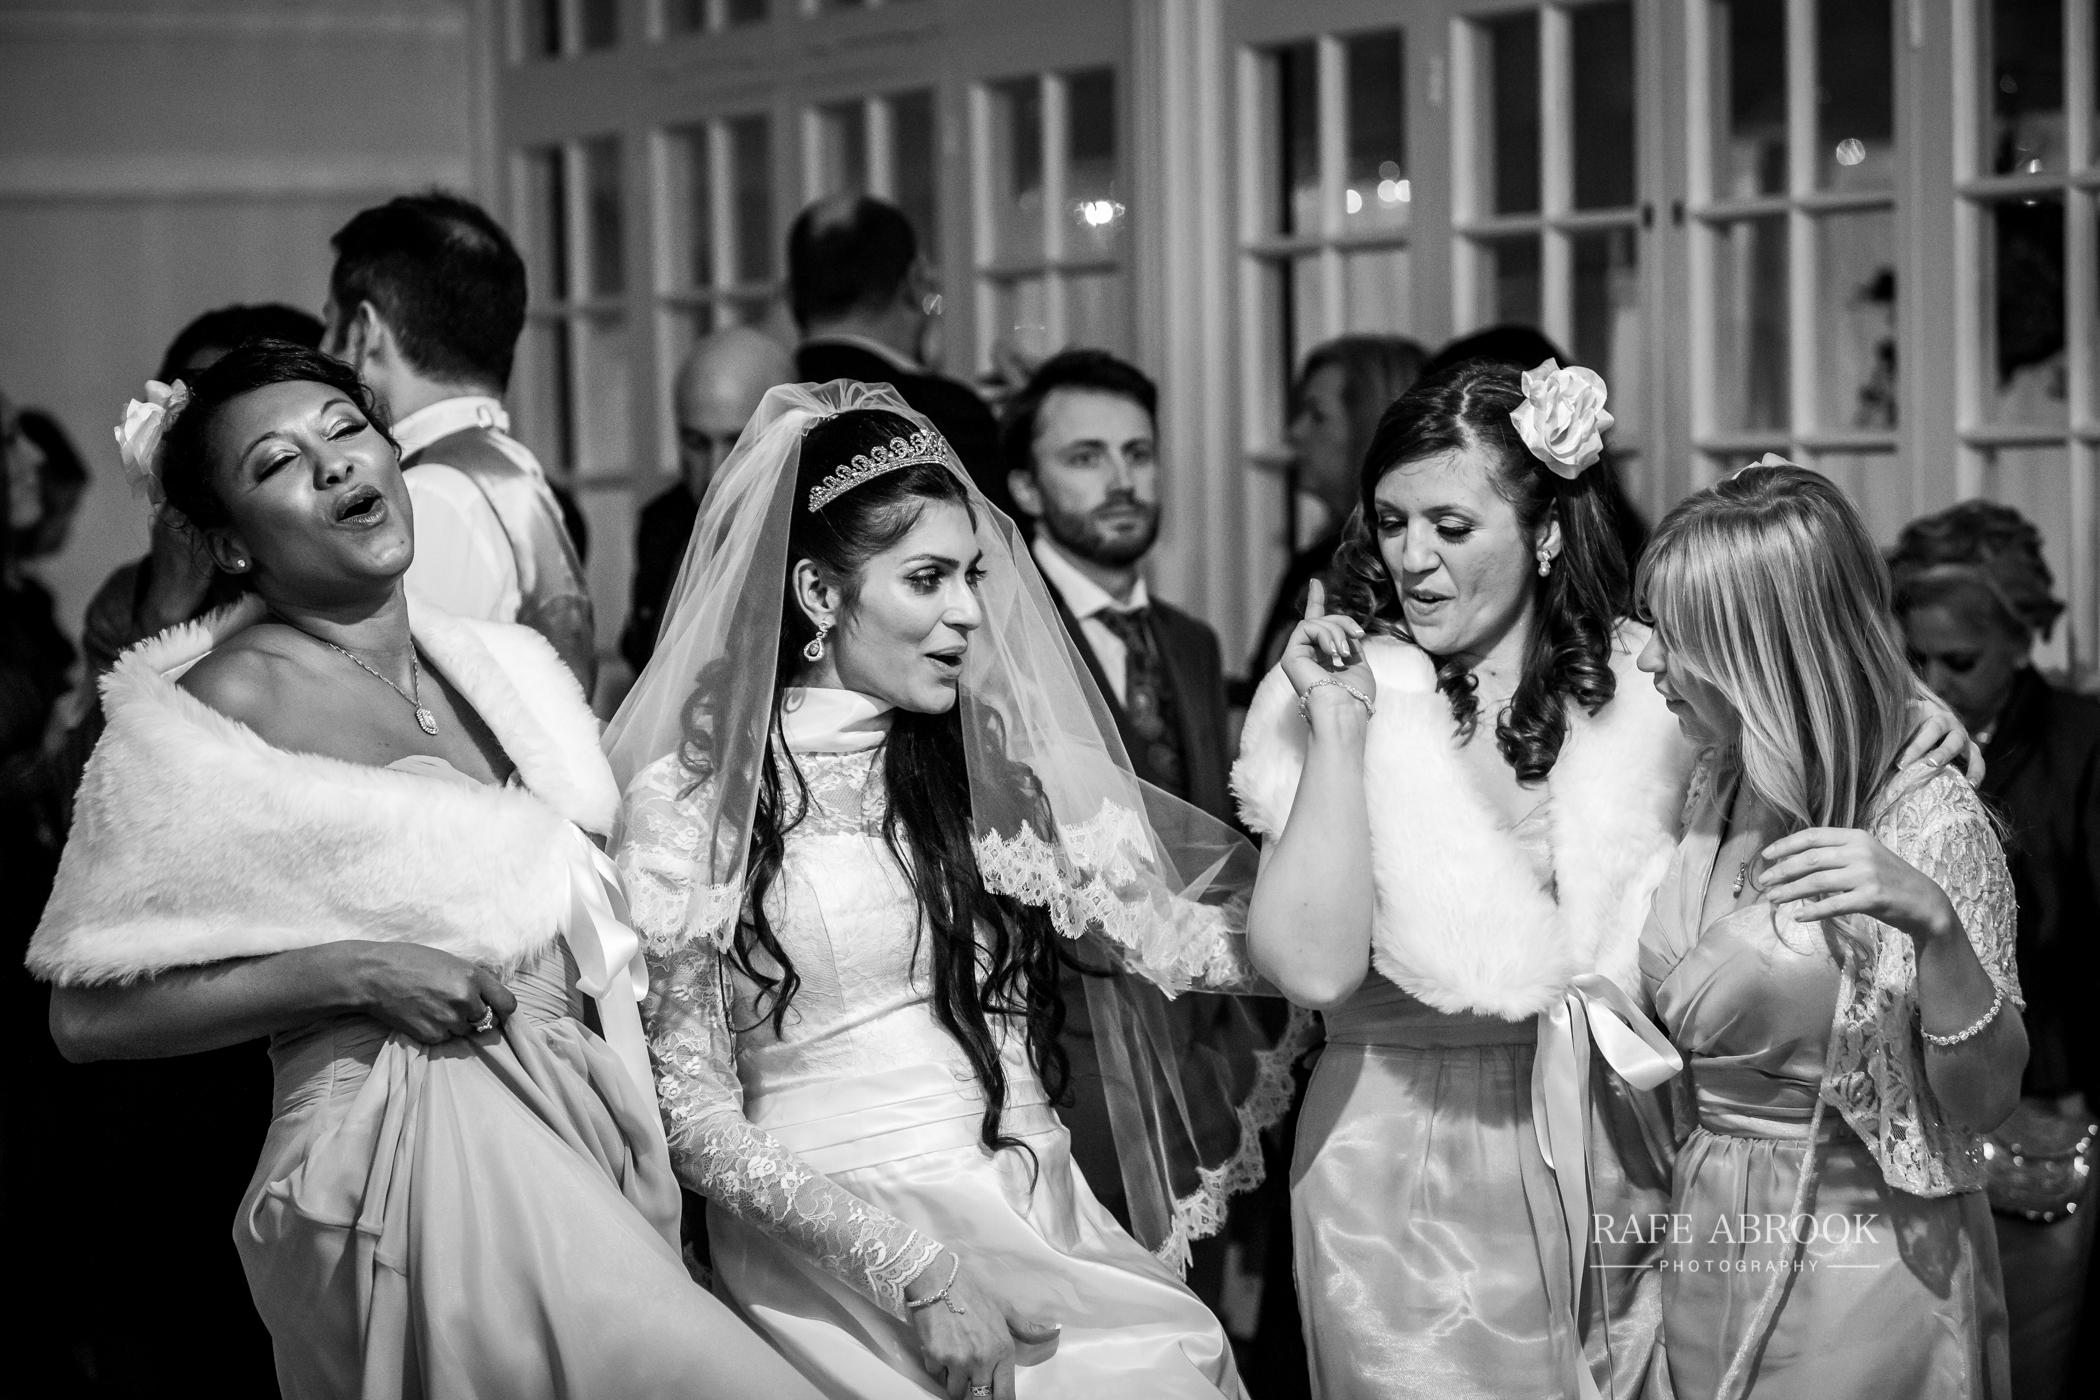 roma & pete wedding hampstead shenley hertfordshire -539.jpg